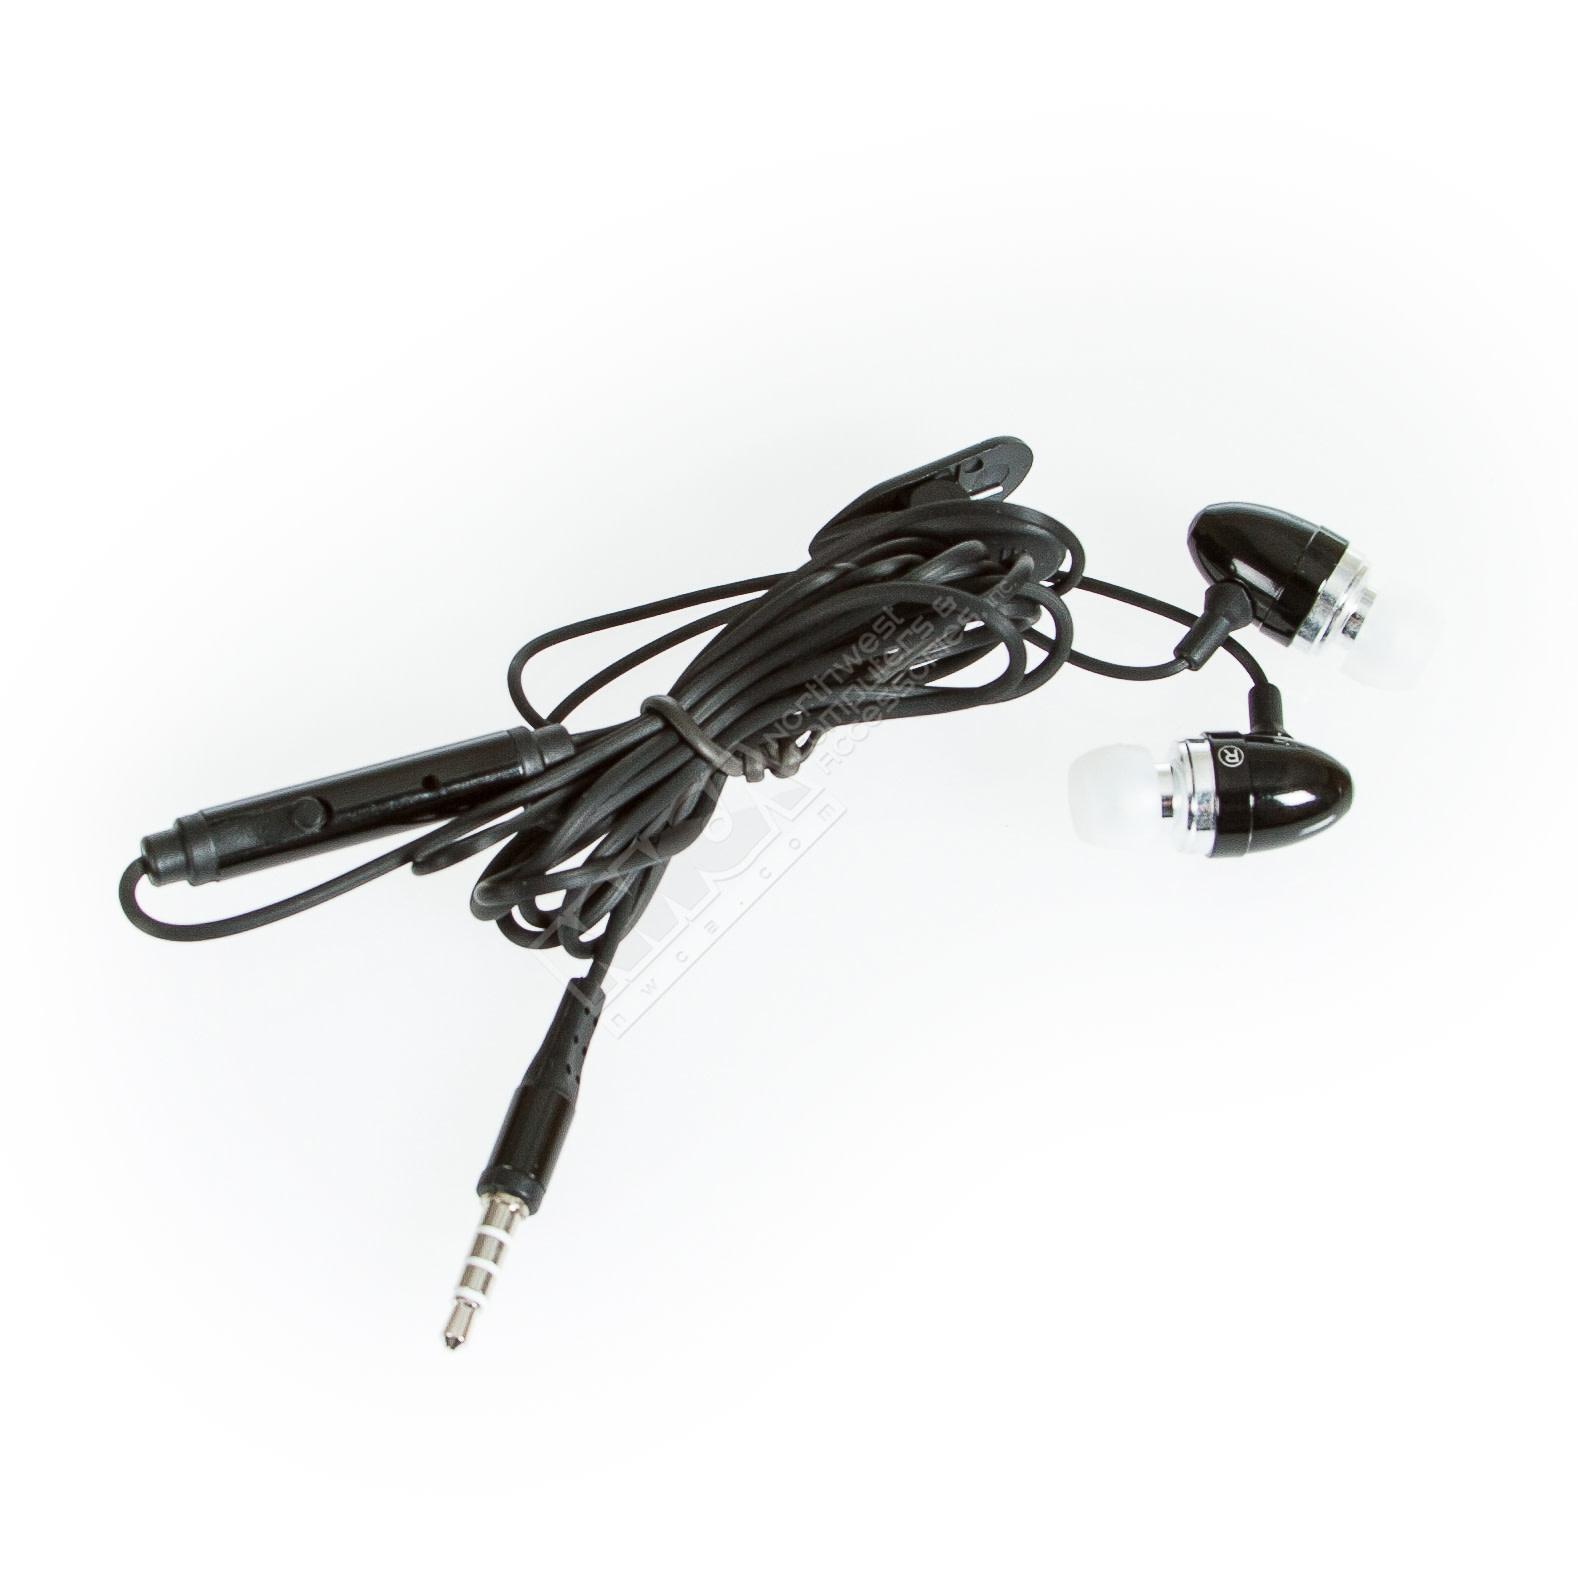 Link Depot Ld Nbook Kit1 Cable Kit Includes Usb Led Light